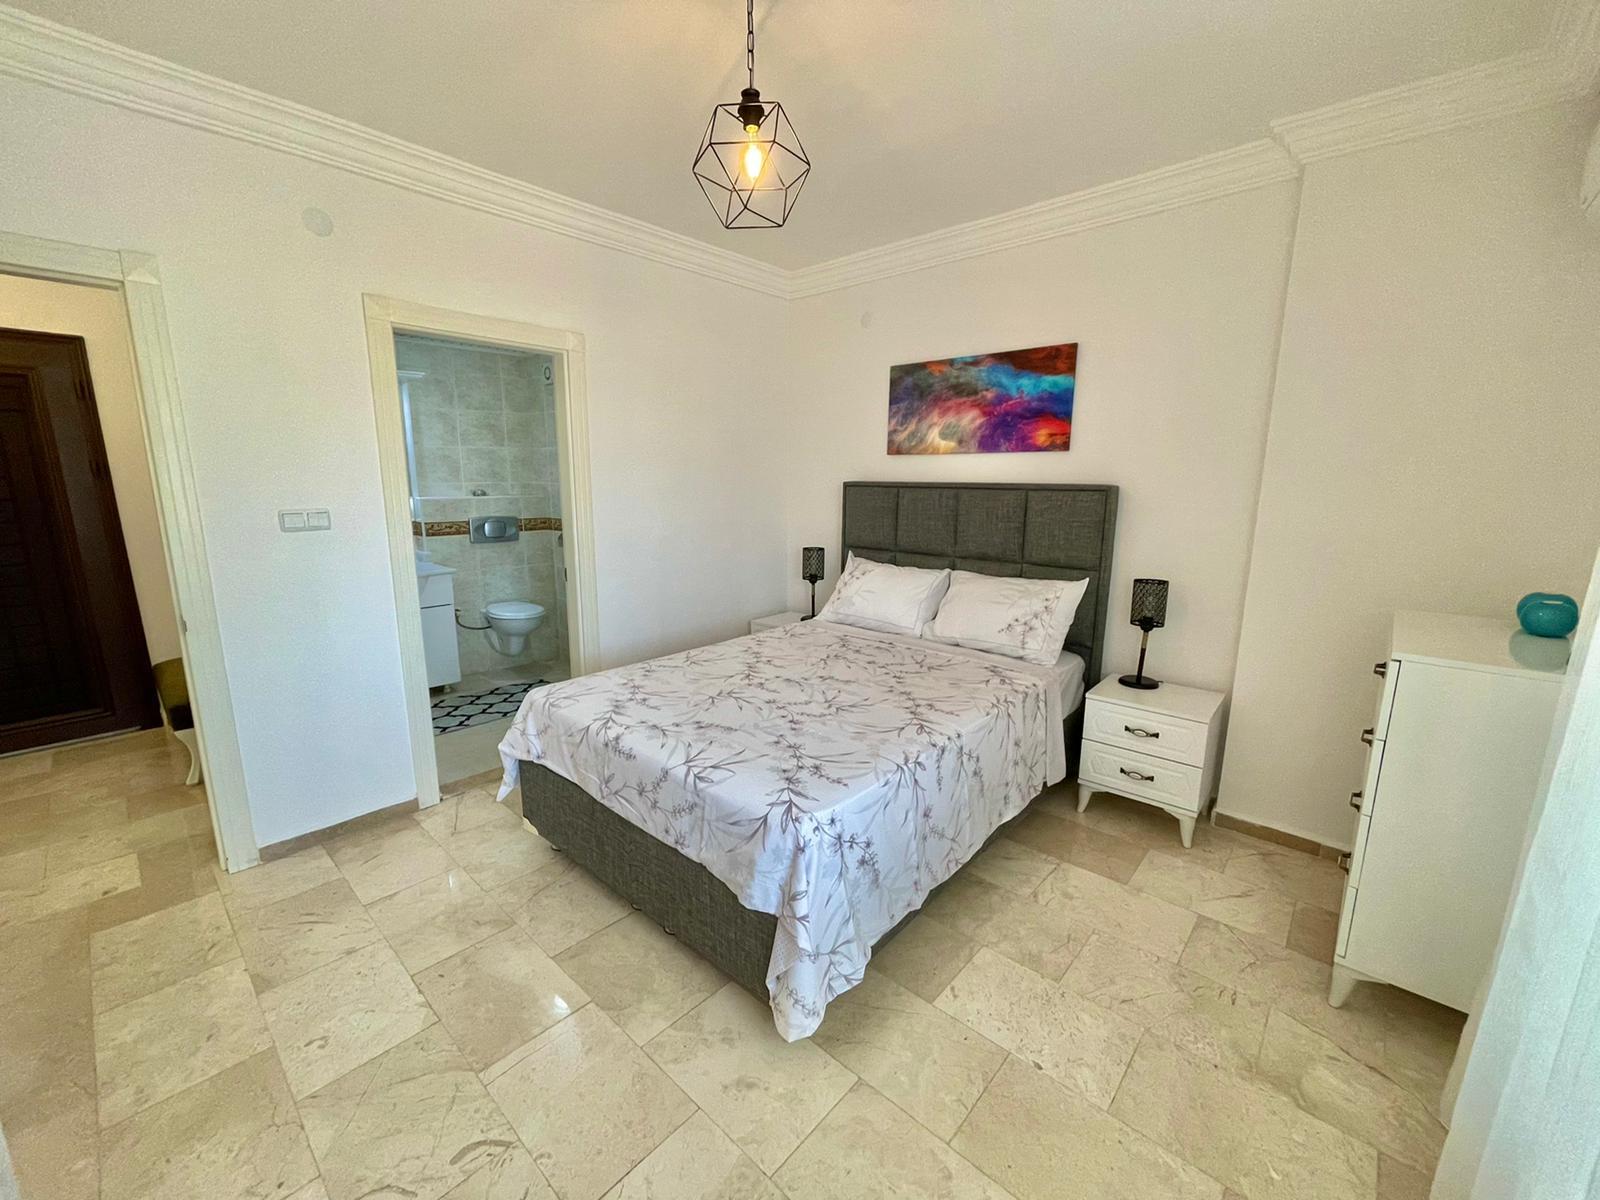 Трёхкомнатная квартира в «двух шагах» от Средиземного моря - Фото 17